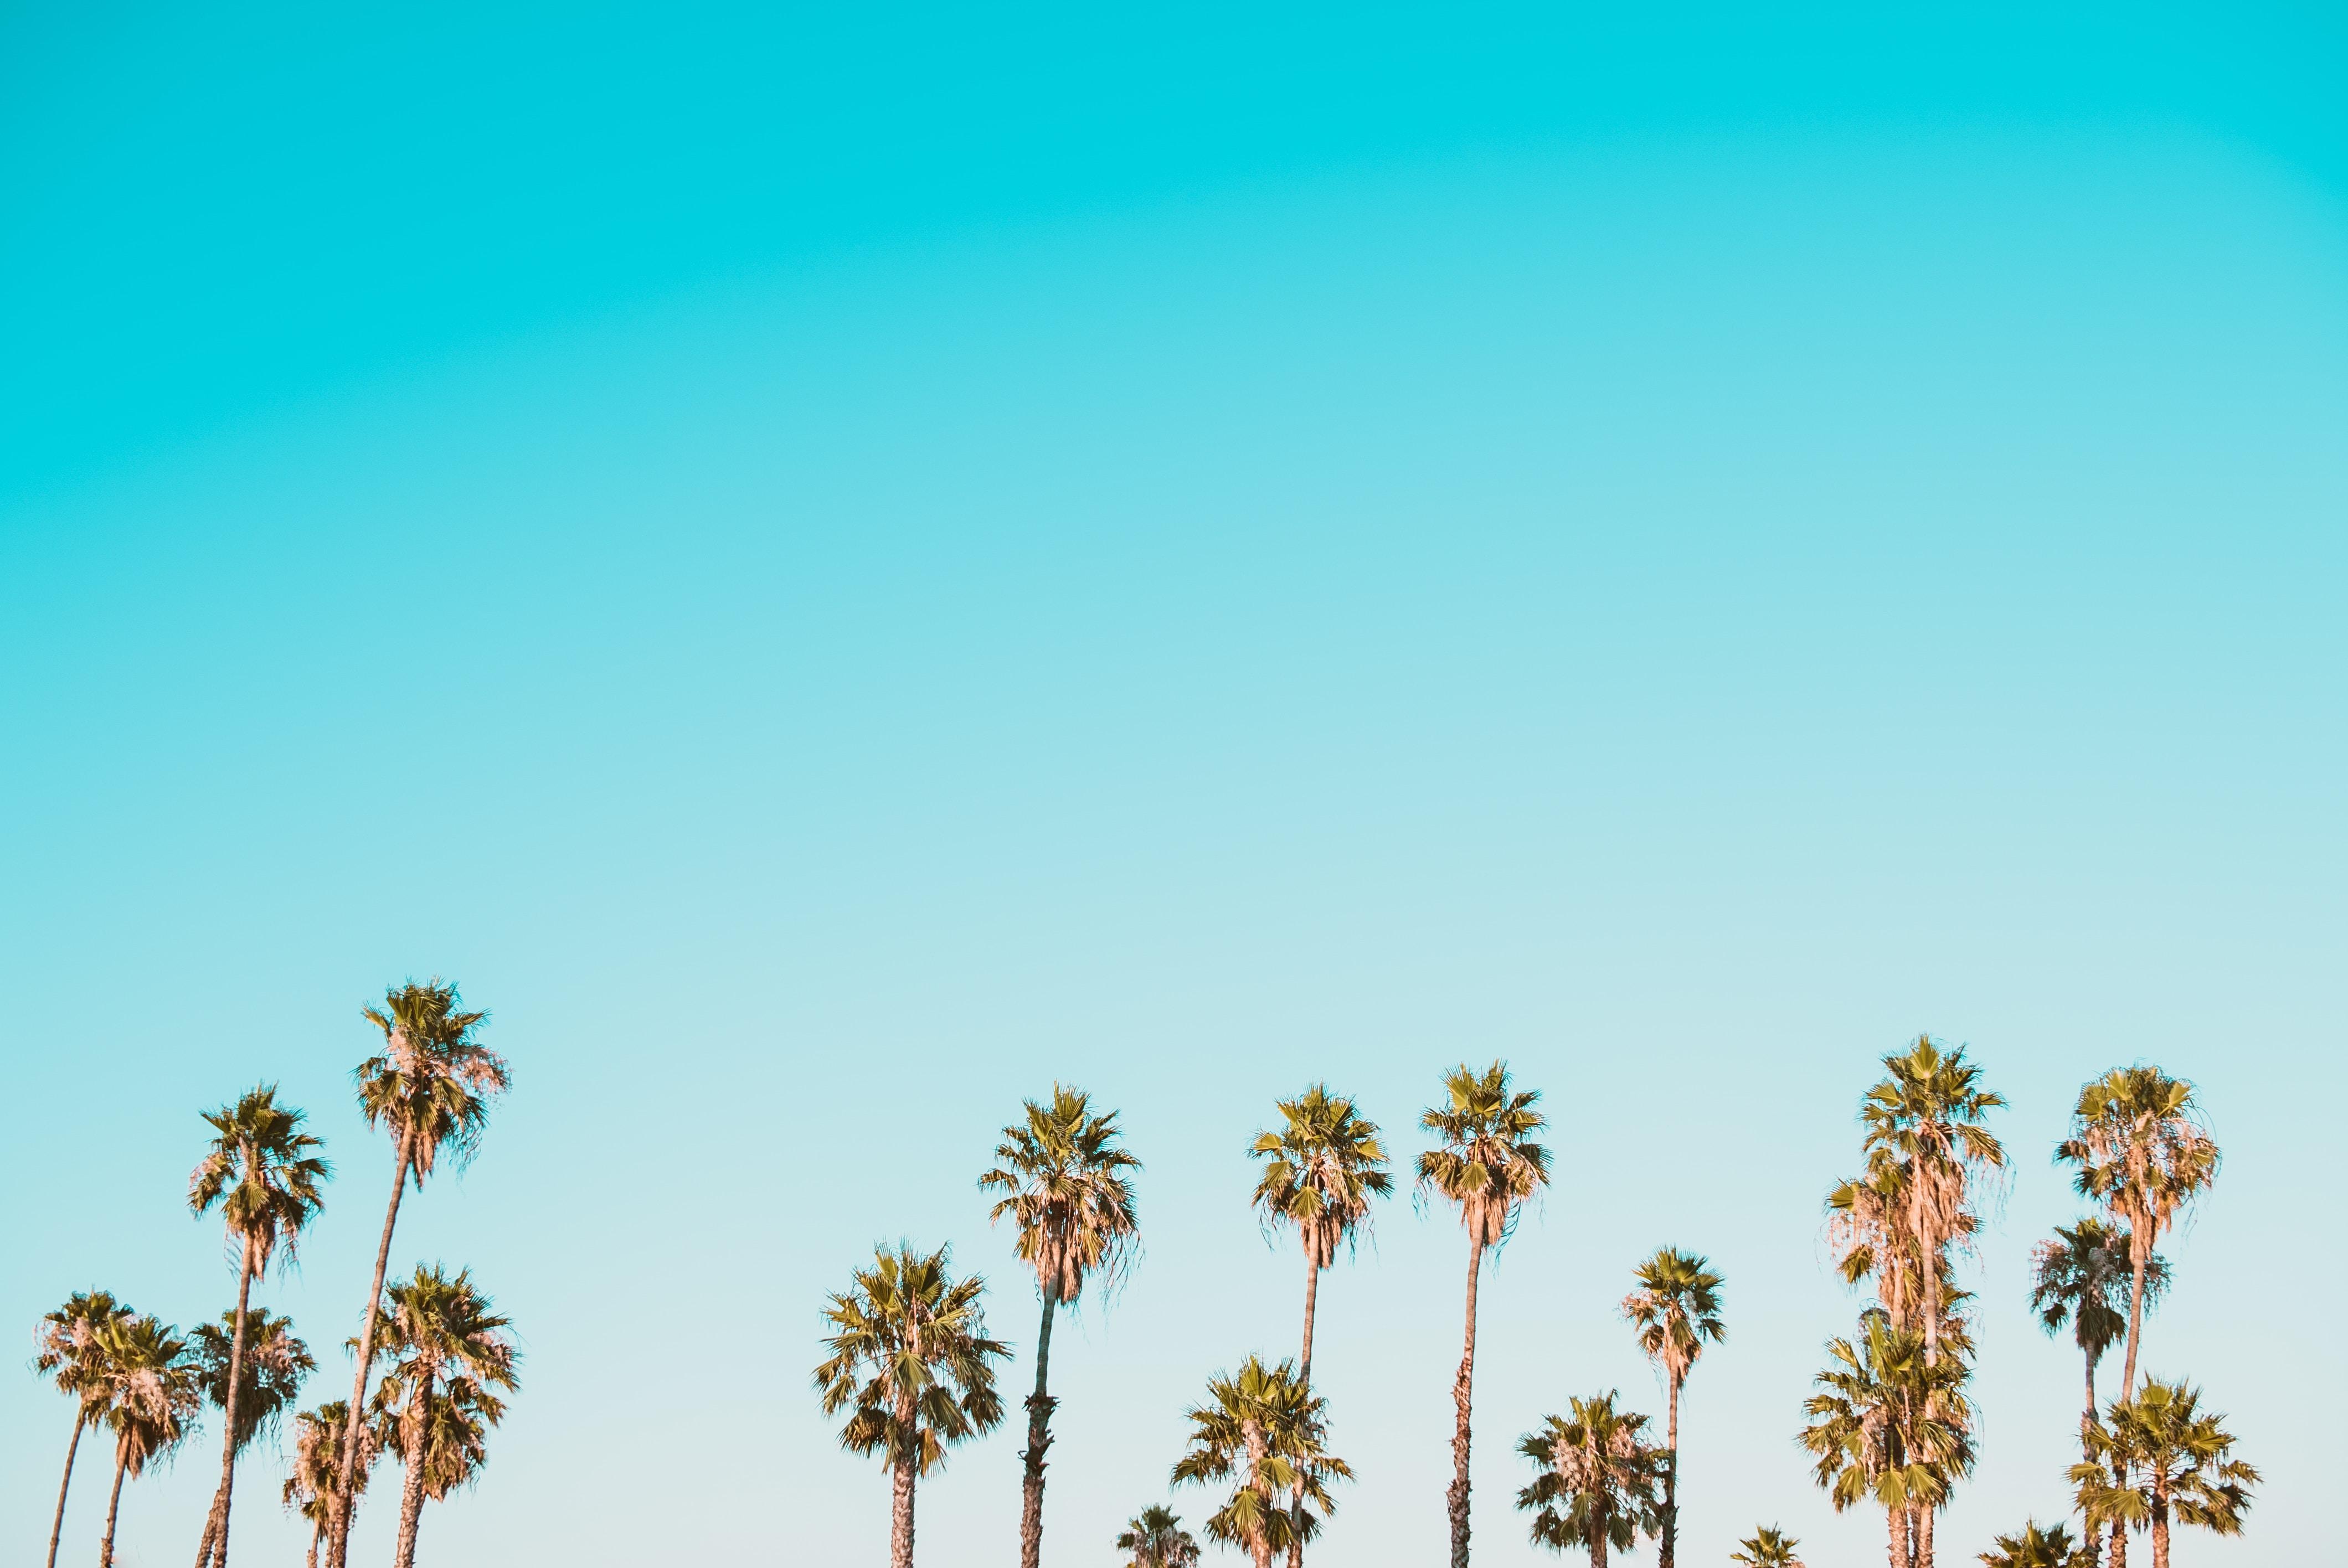 Tall palm trees against  a light blue sky